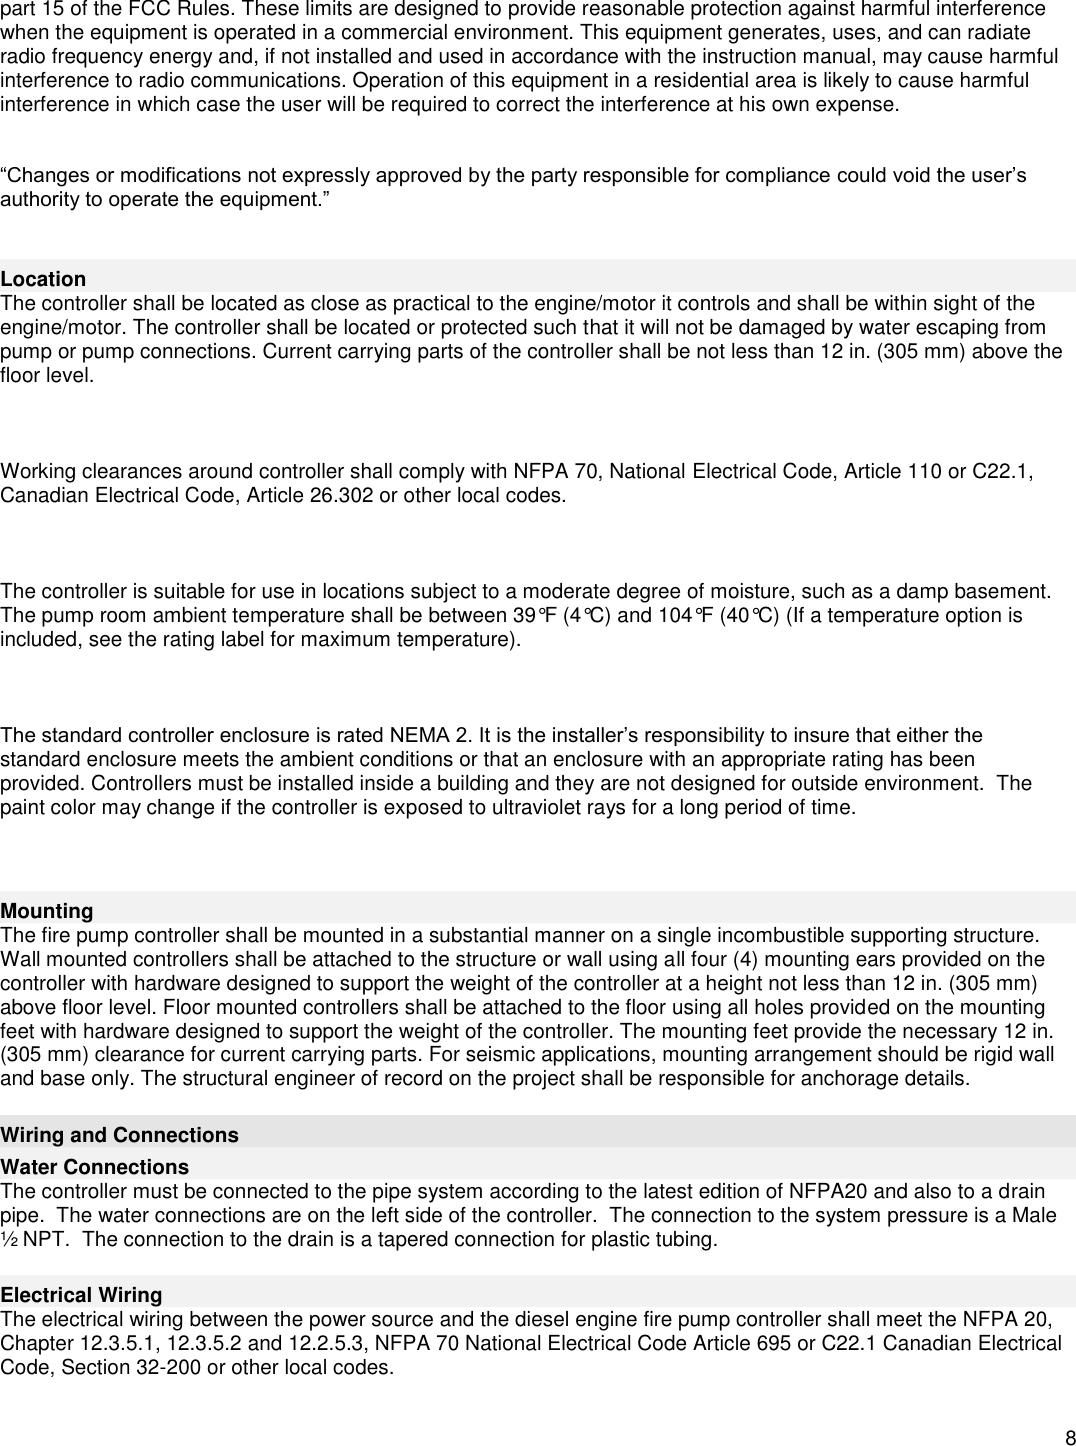 TORNATECH VIZITOUCH2 HMI interface User Manual on